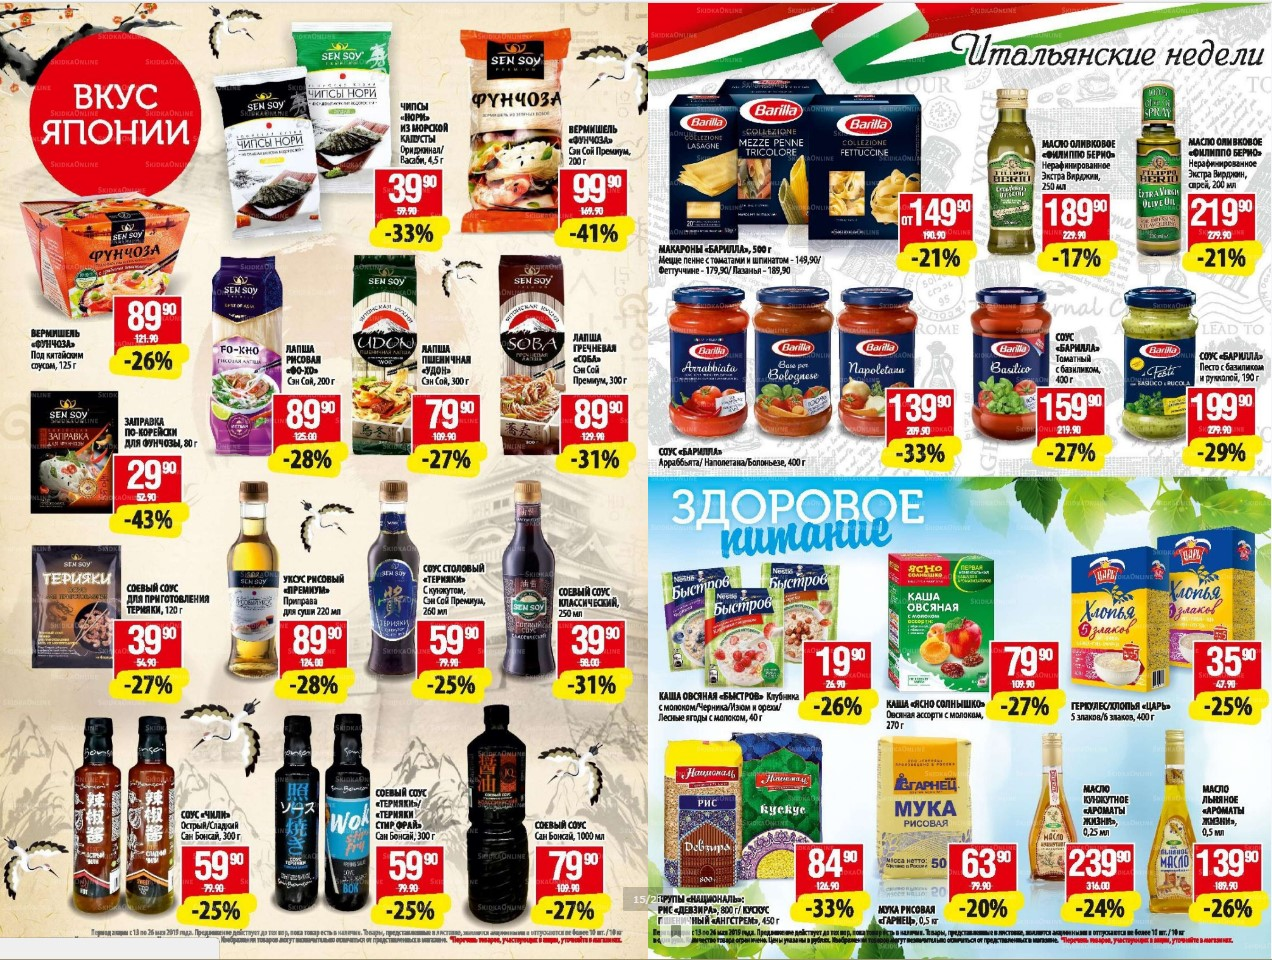 Каталог гипермаркетов Райт 13-26.05.2019 стр.08